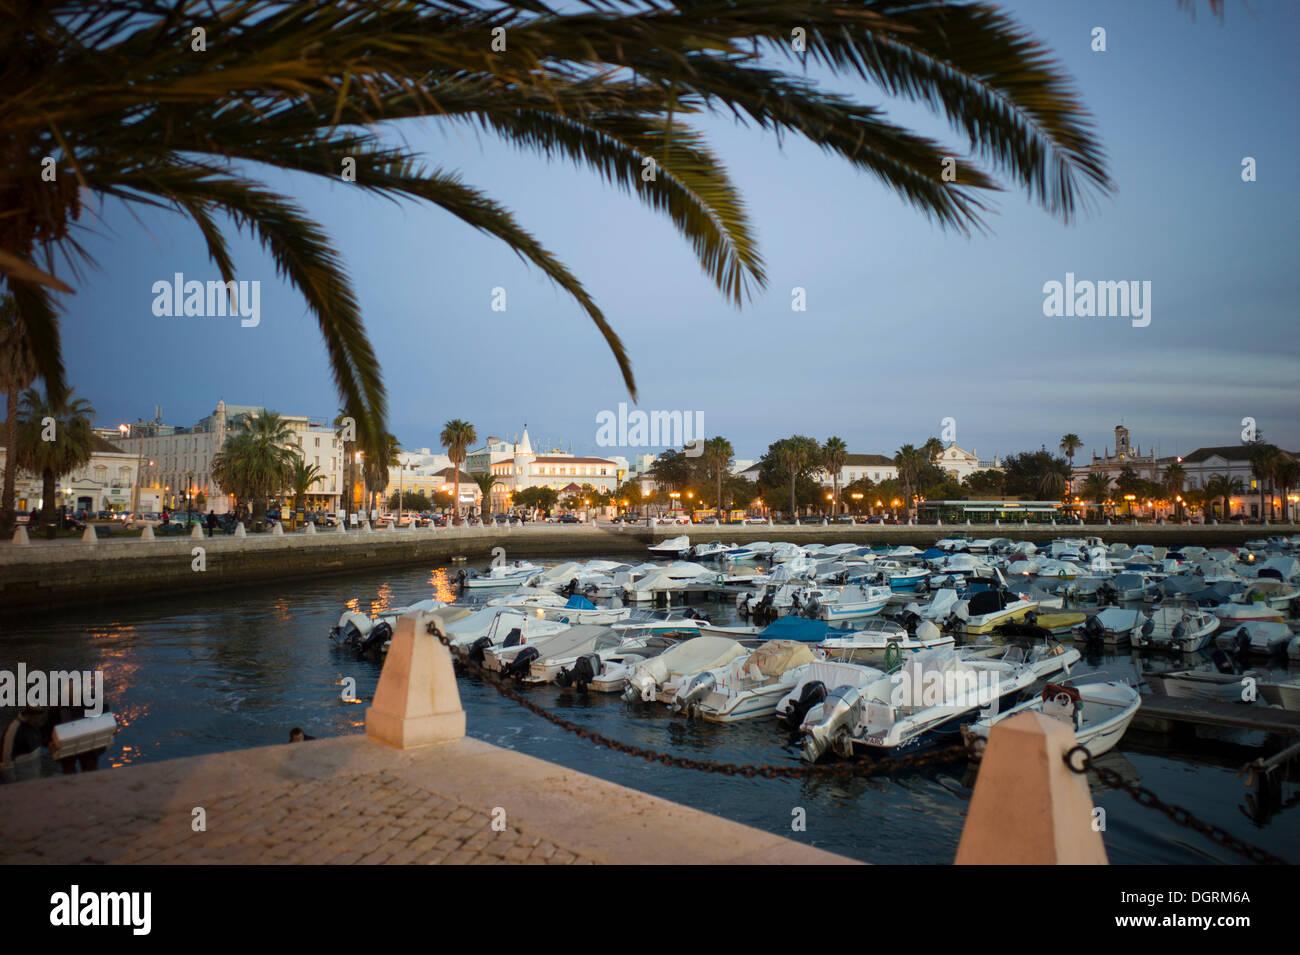 Marina, Faro, Algarve, Portugal, Europe - Stock Image